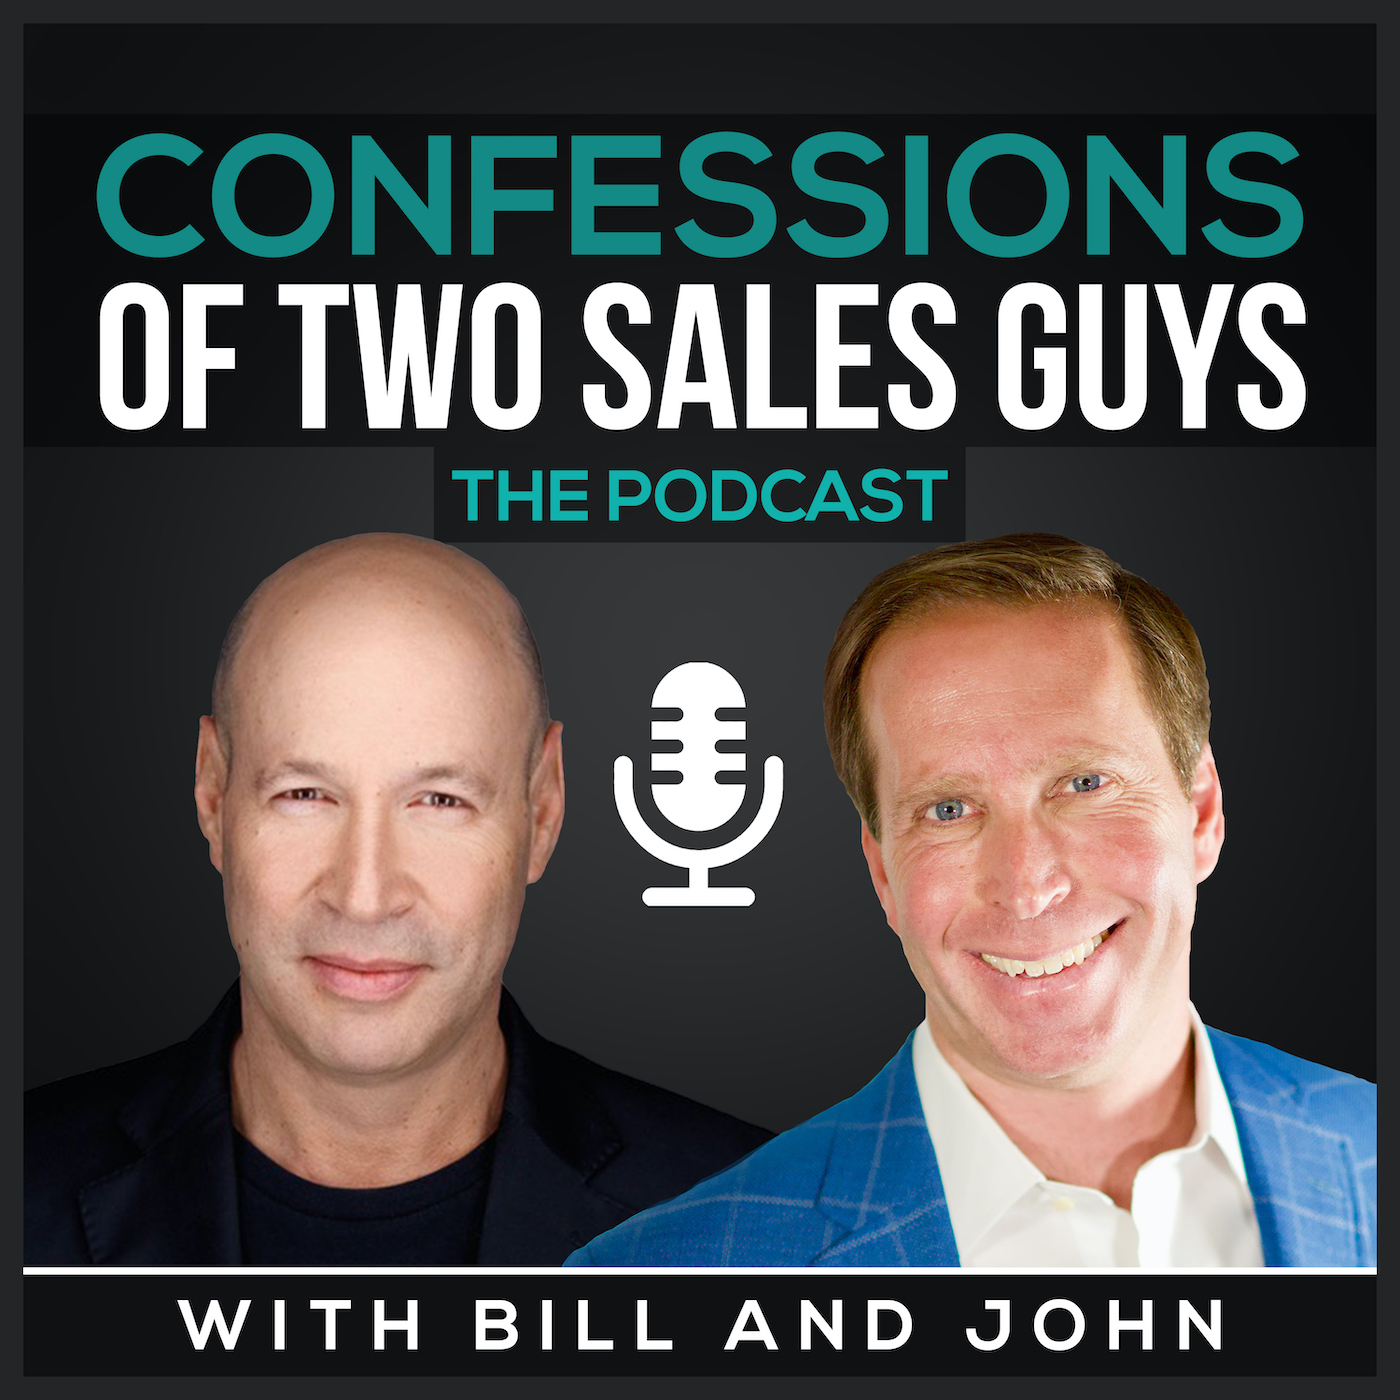 Denver Marketing – Sales Podcast On Using A CNA